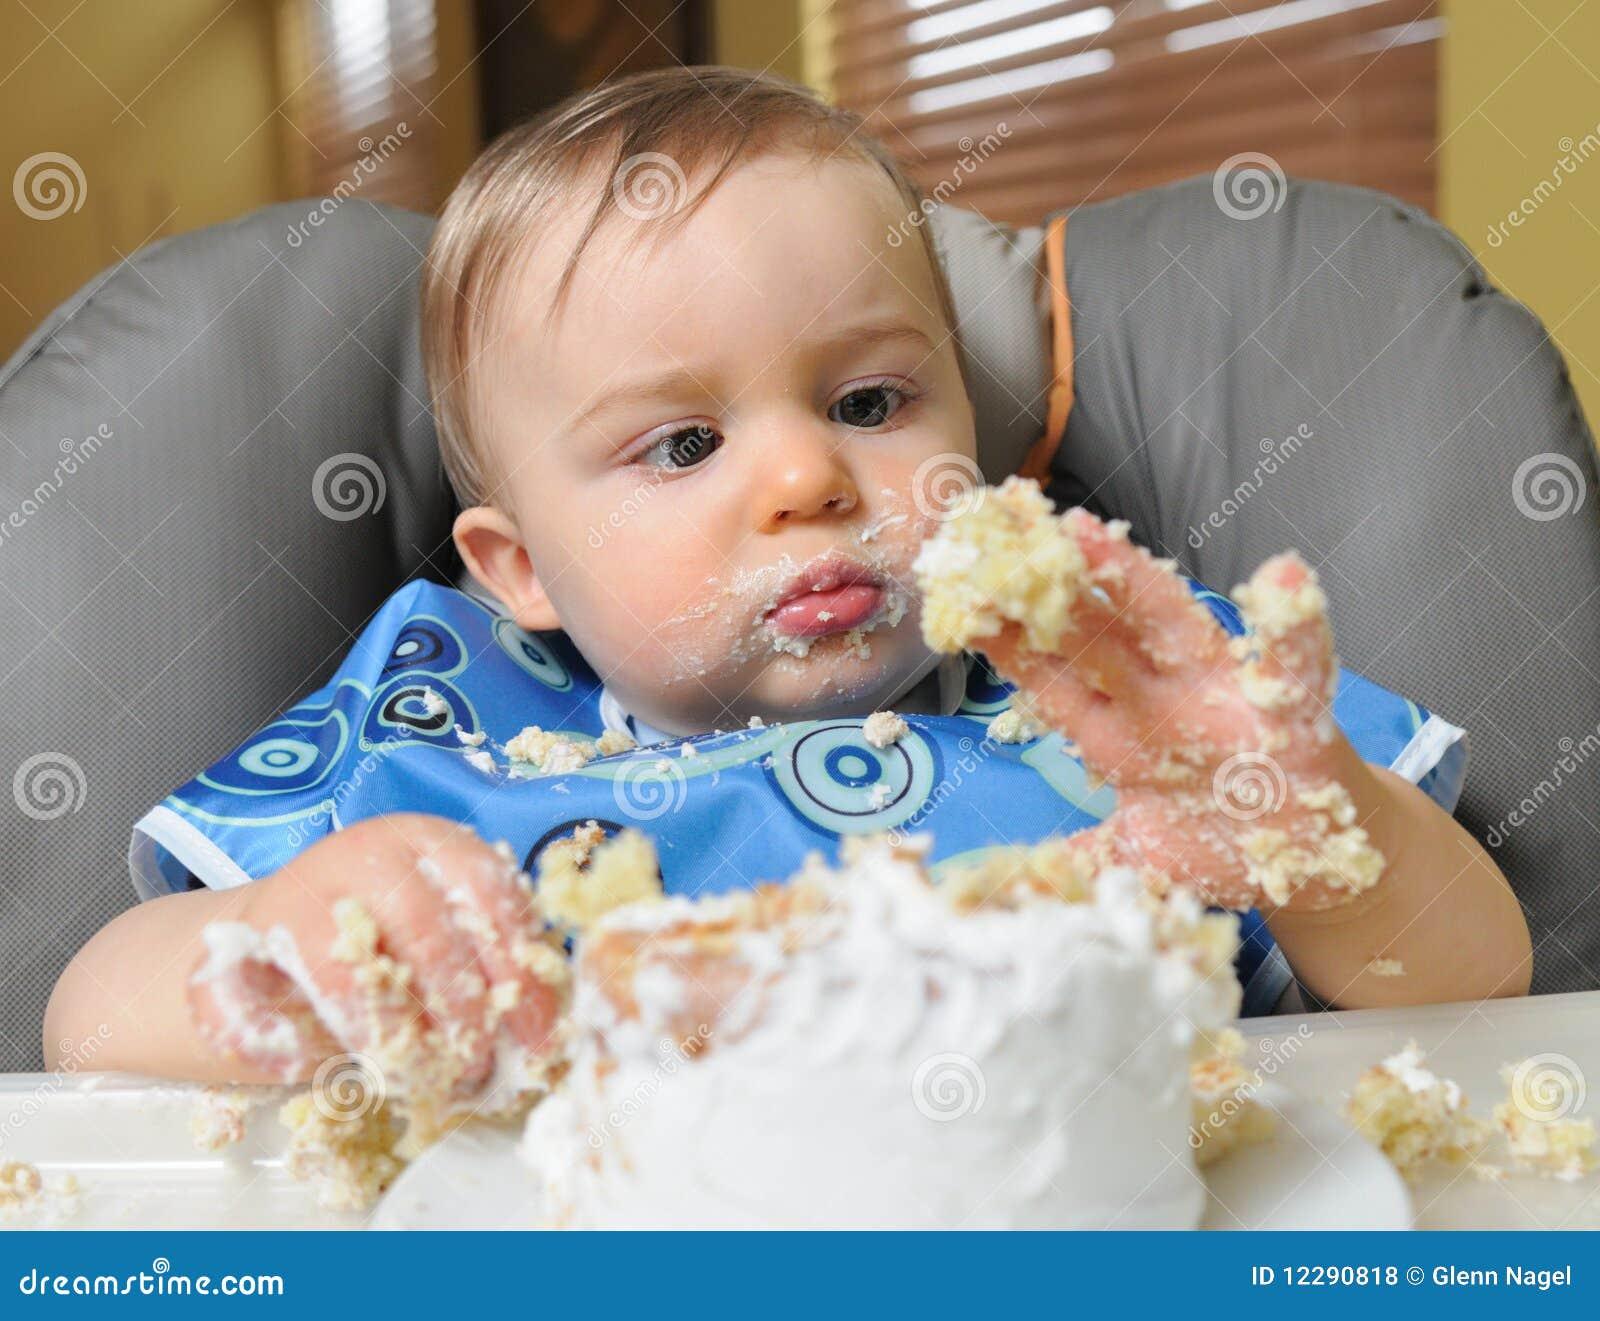 Baby Boy Makes Mess Of Cake Stock Photo